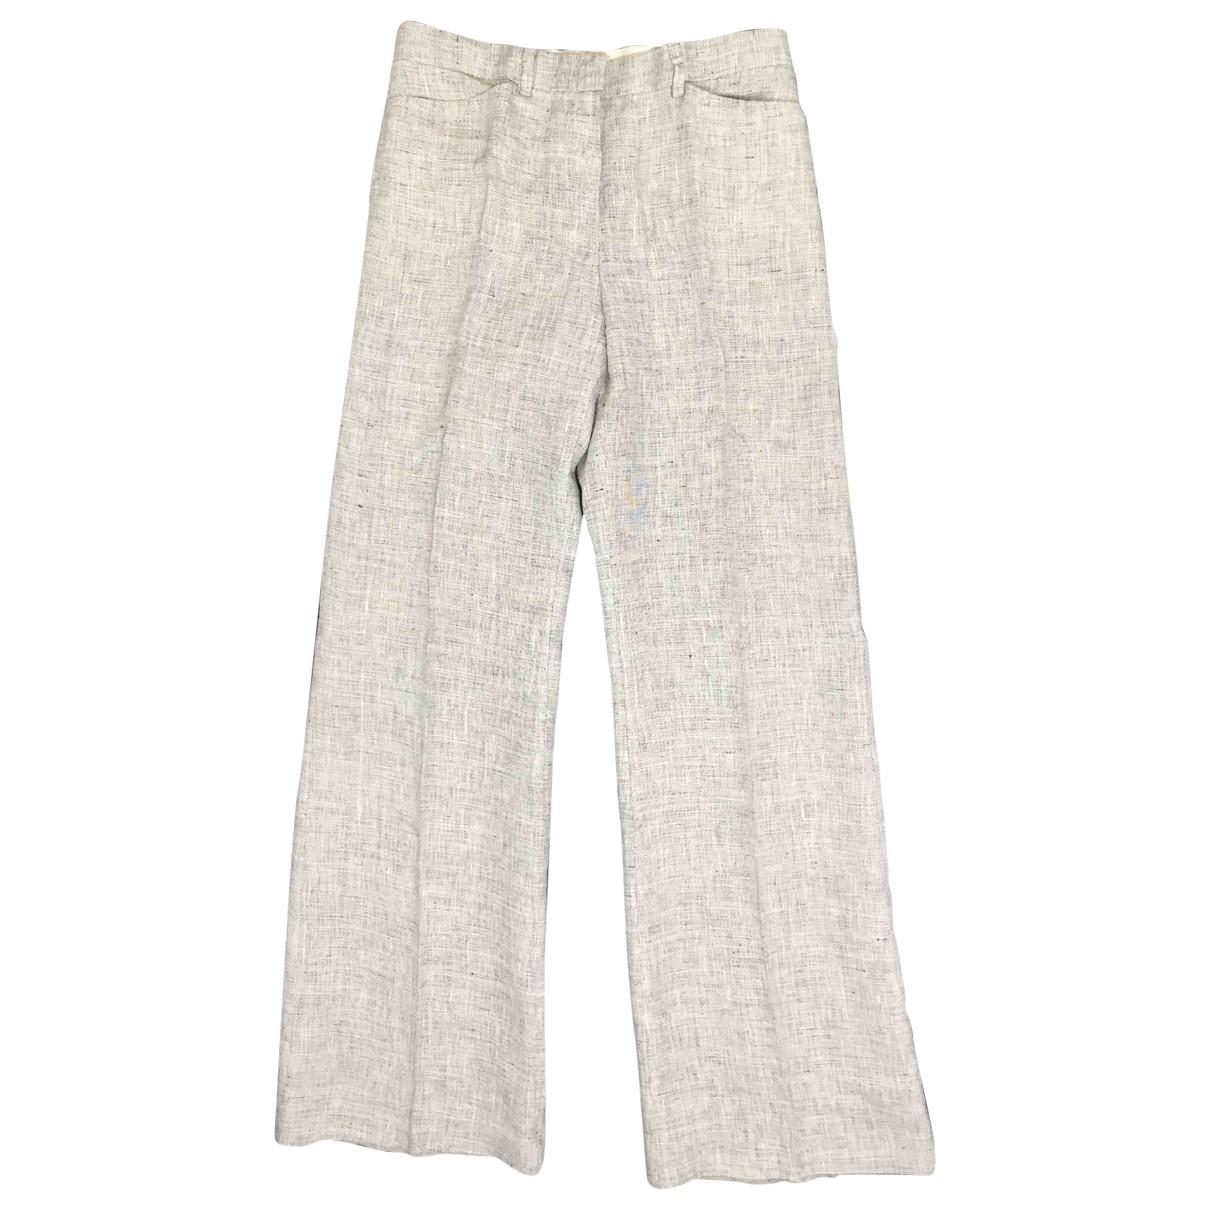 Emporio Armani \N Grey Linen Trousers for Women 38 IT